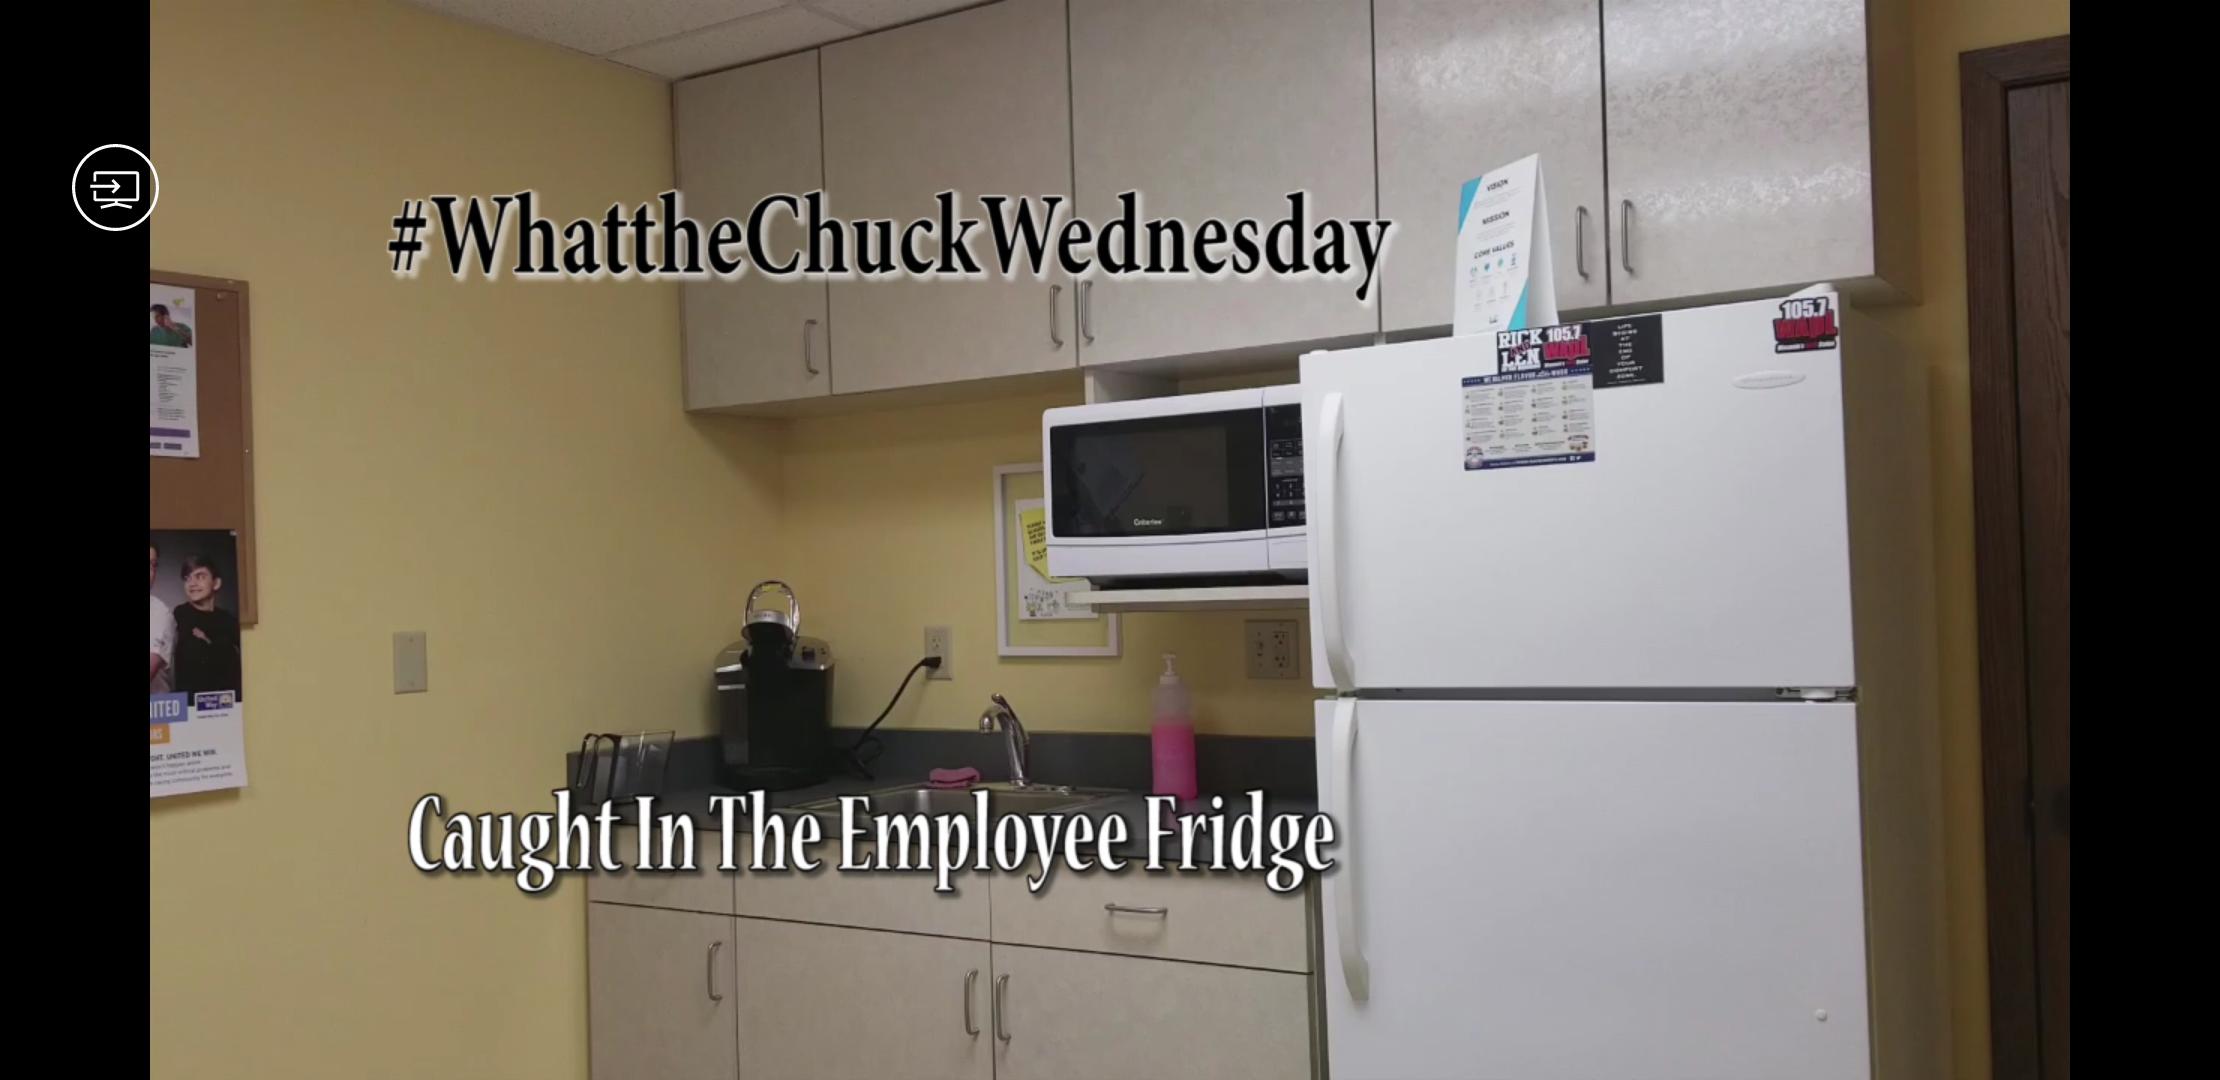 #WhattheChuckWednesday - Caught In The Employee Fridge